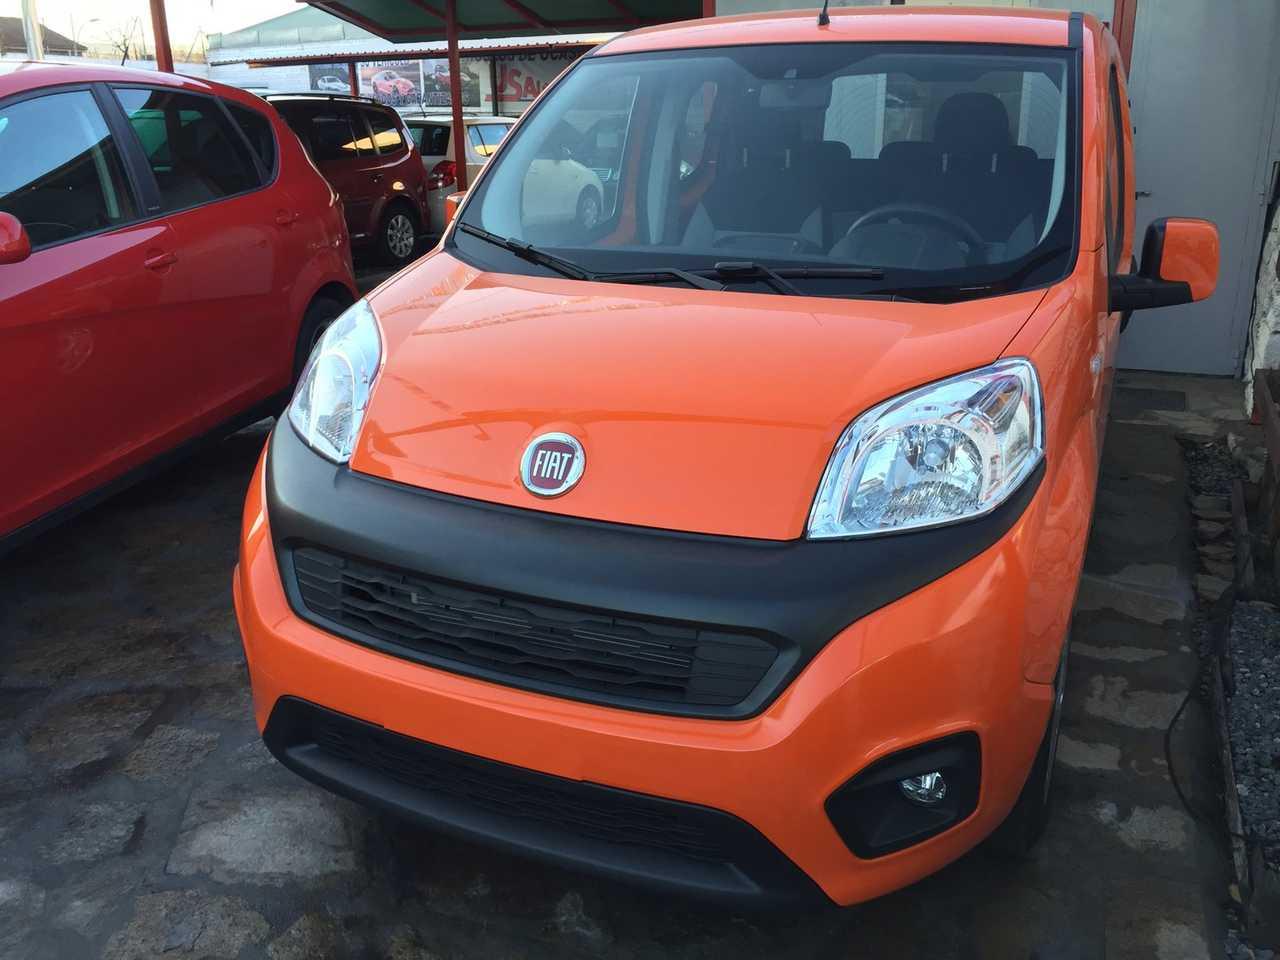 Fiat Qubo 1.3 MJET LOUNGE   - Foto 1